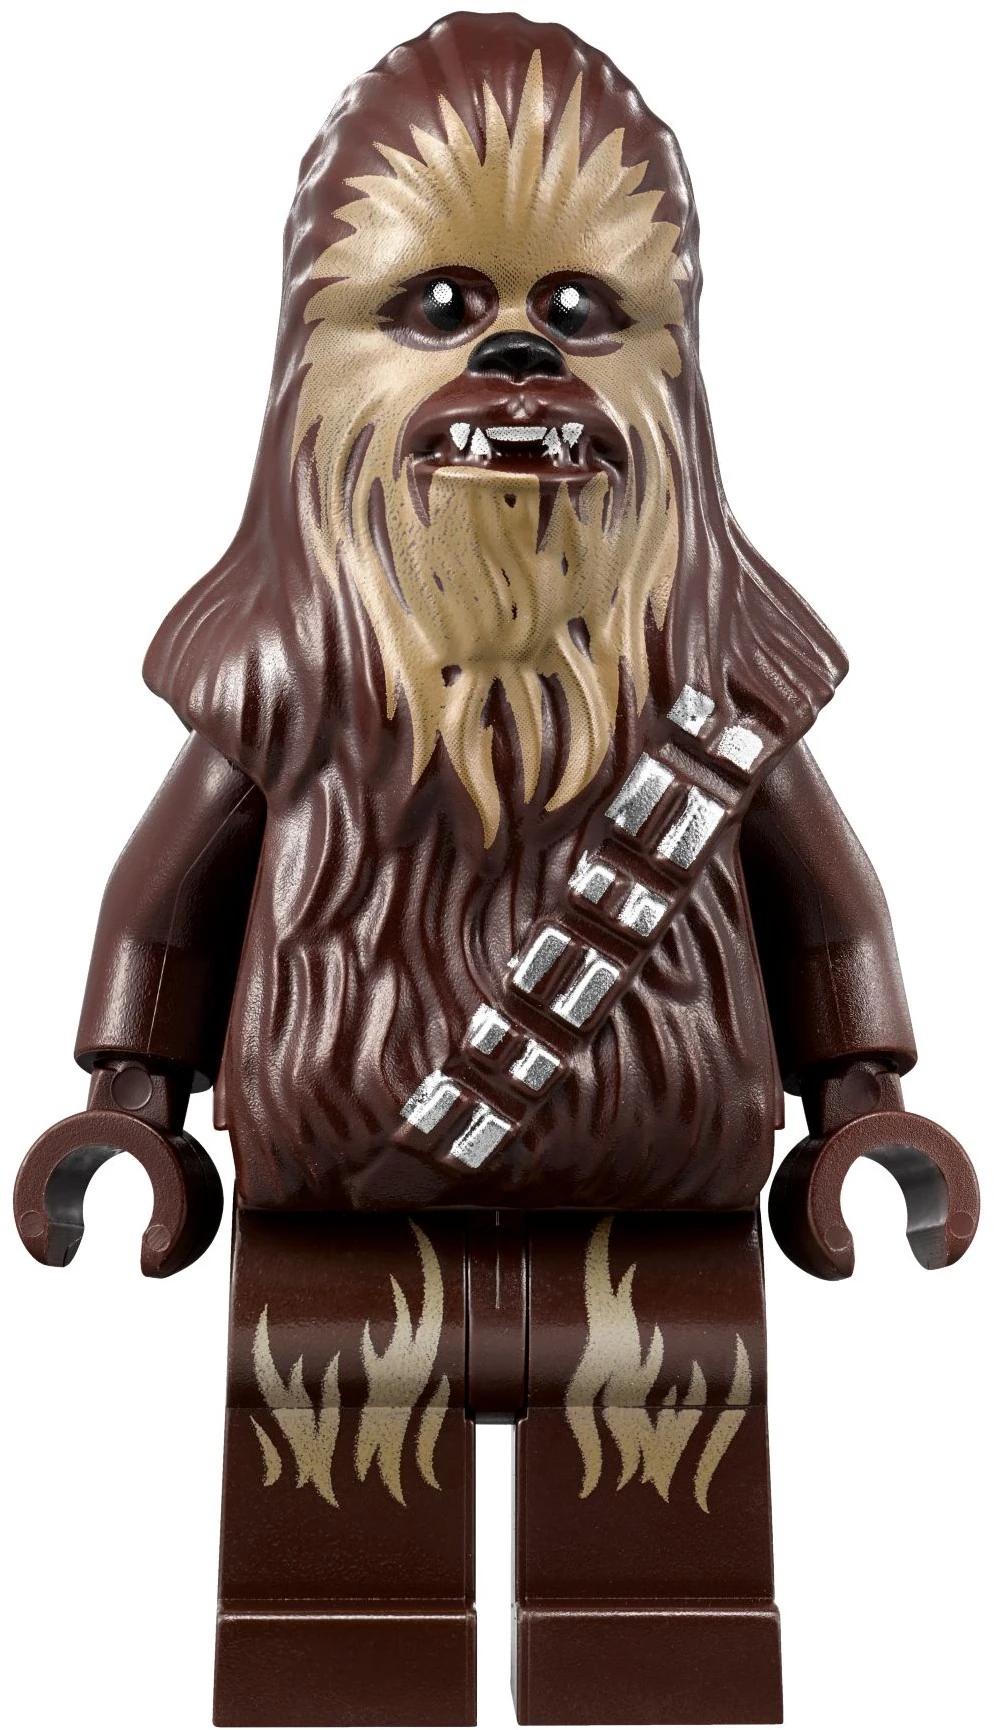 Chewbacca - Brickipedia, the LEGO Wiki